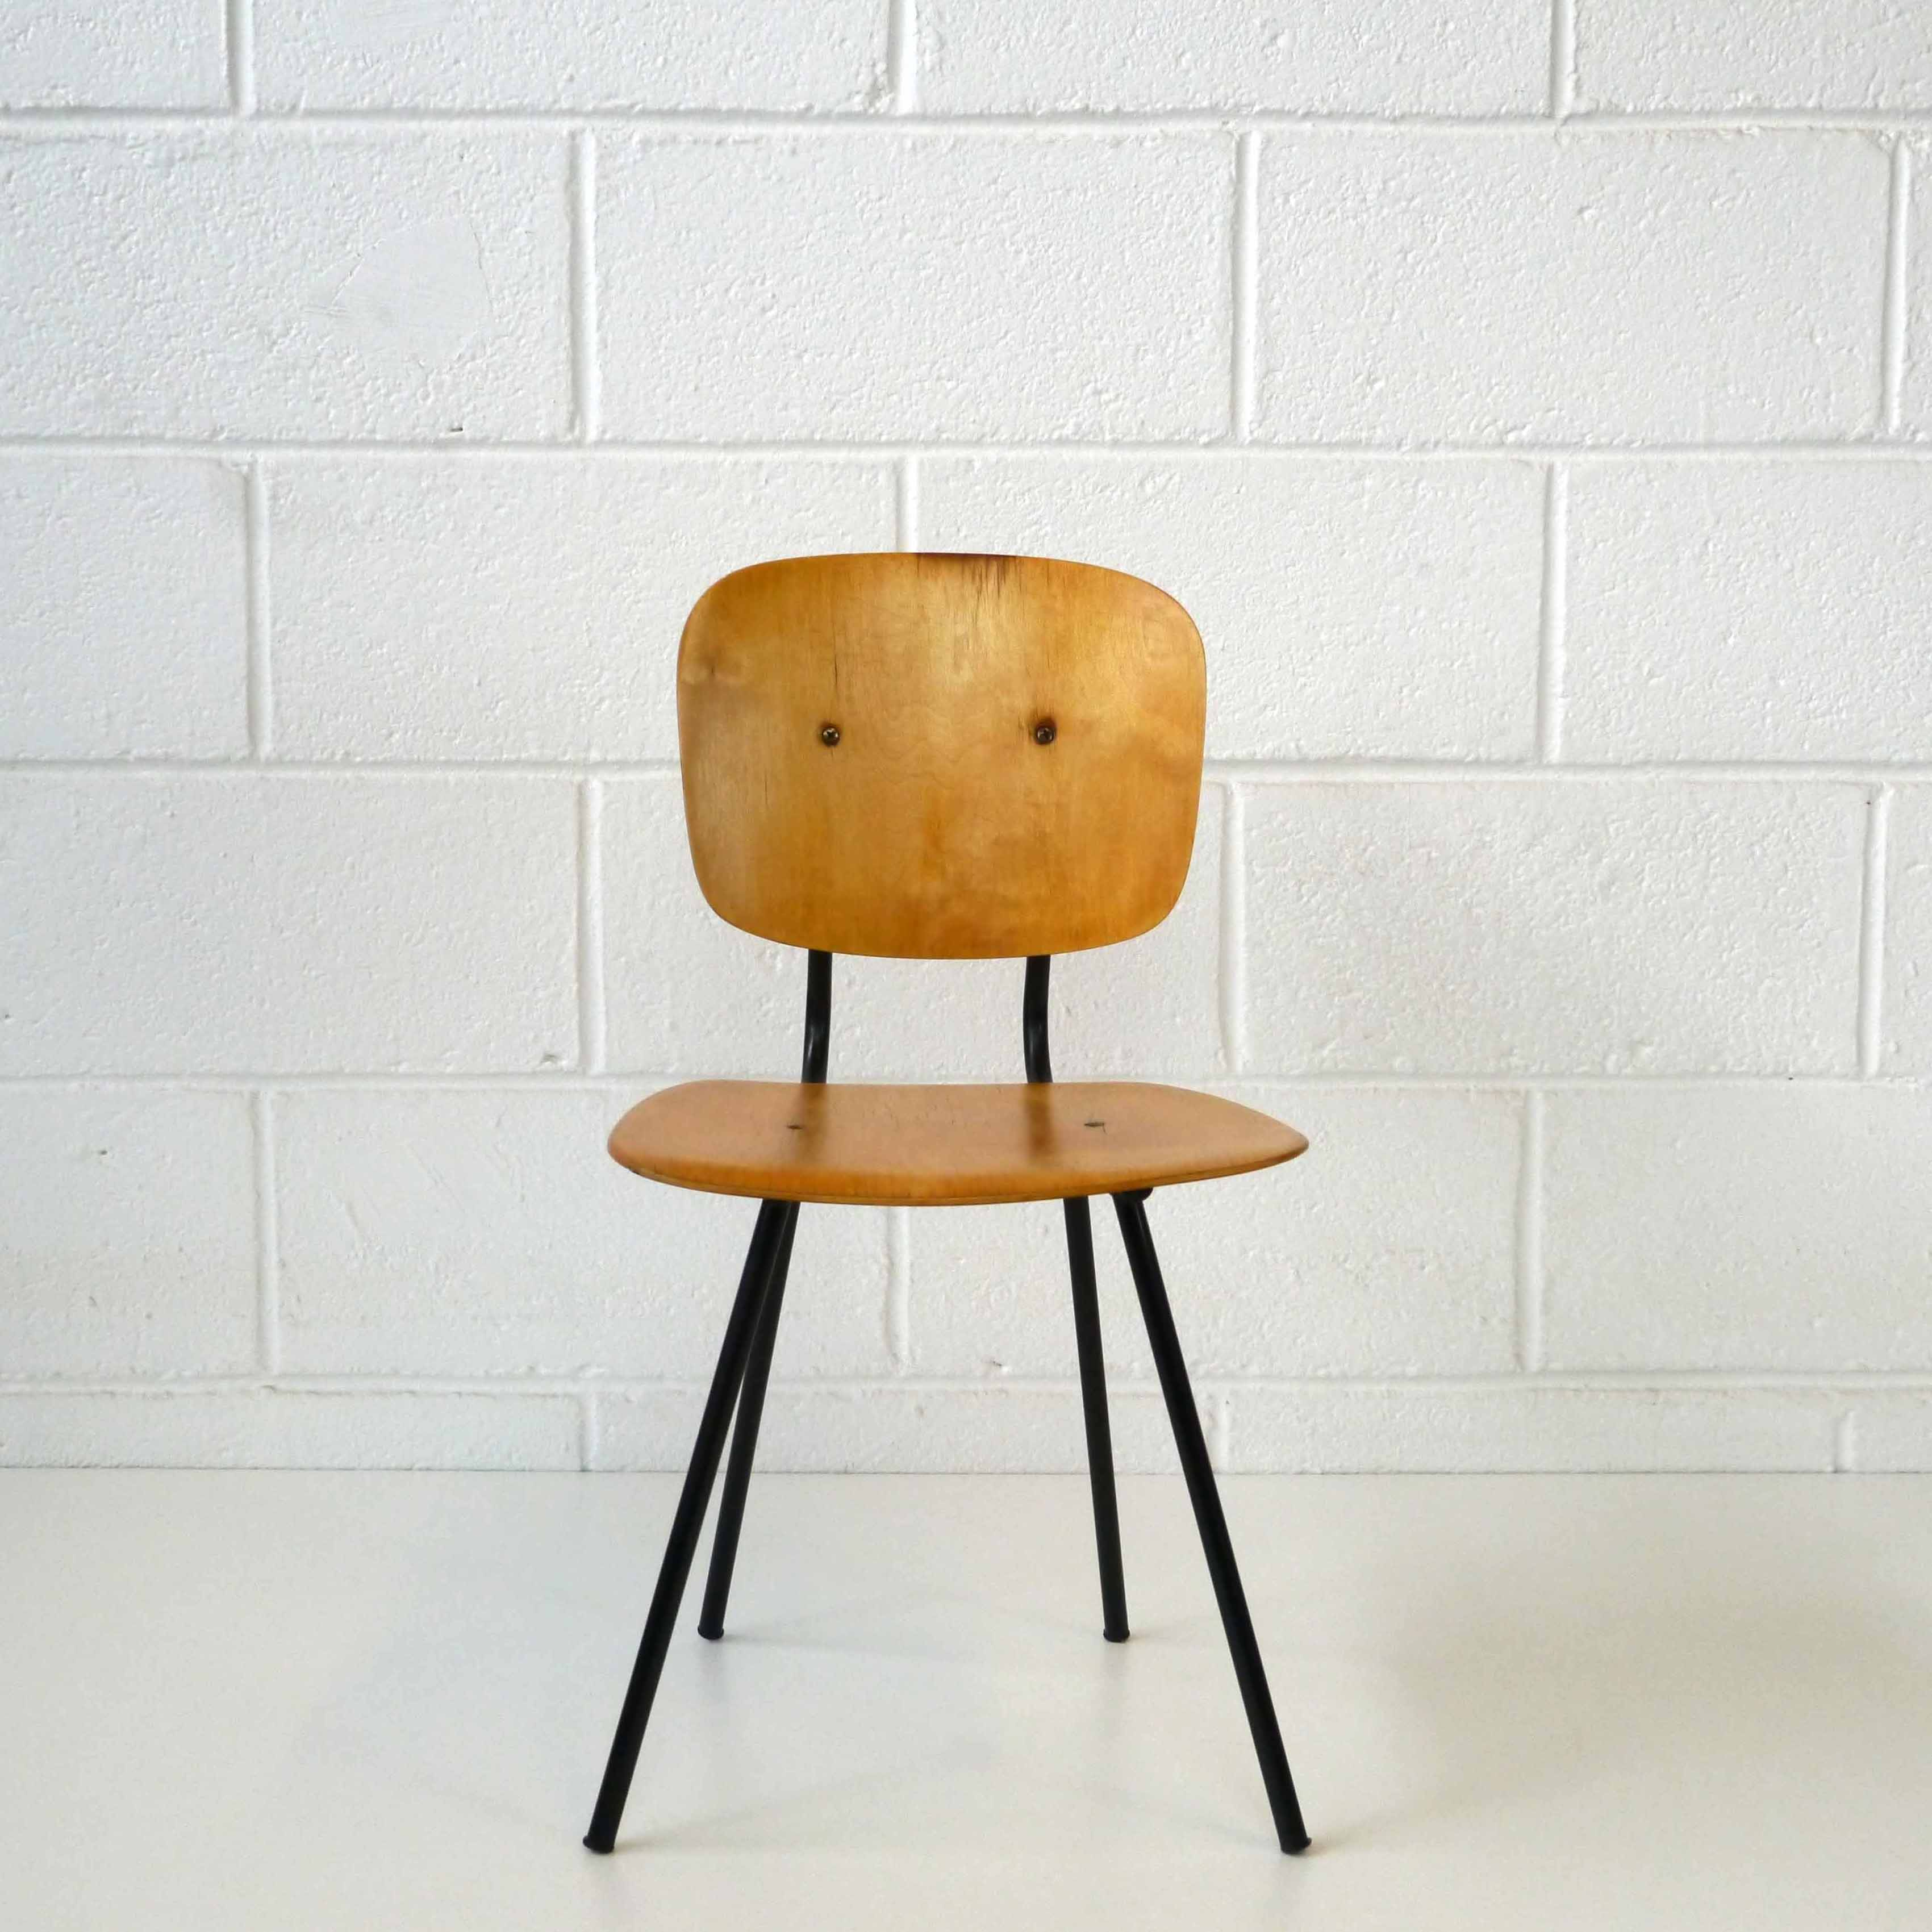 chaise enfant design 1950 la marelle mobilier et d co vintage enfants. Black Bedroom Furniture Sets. Home Design Ideas